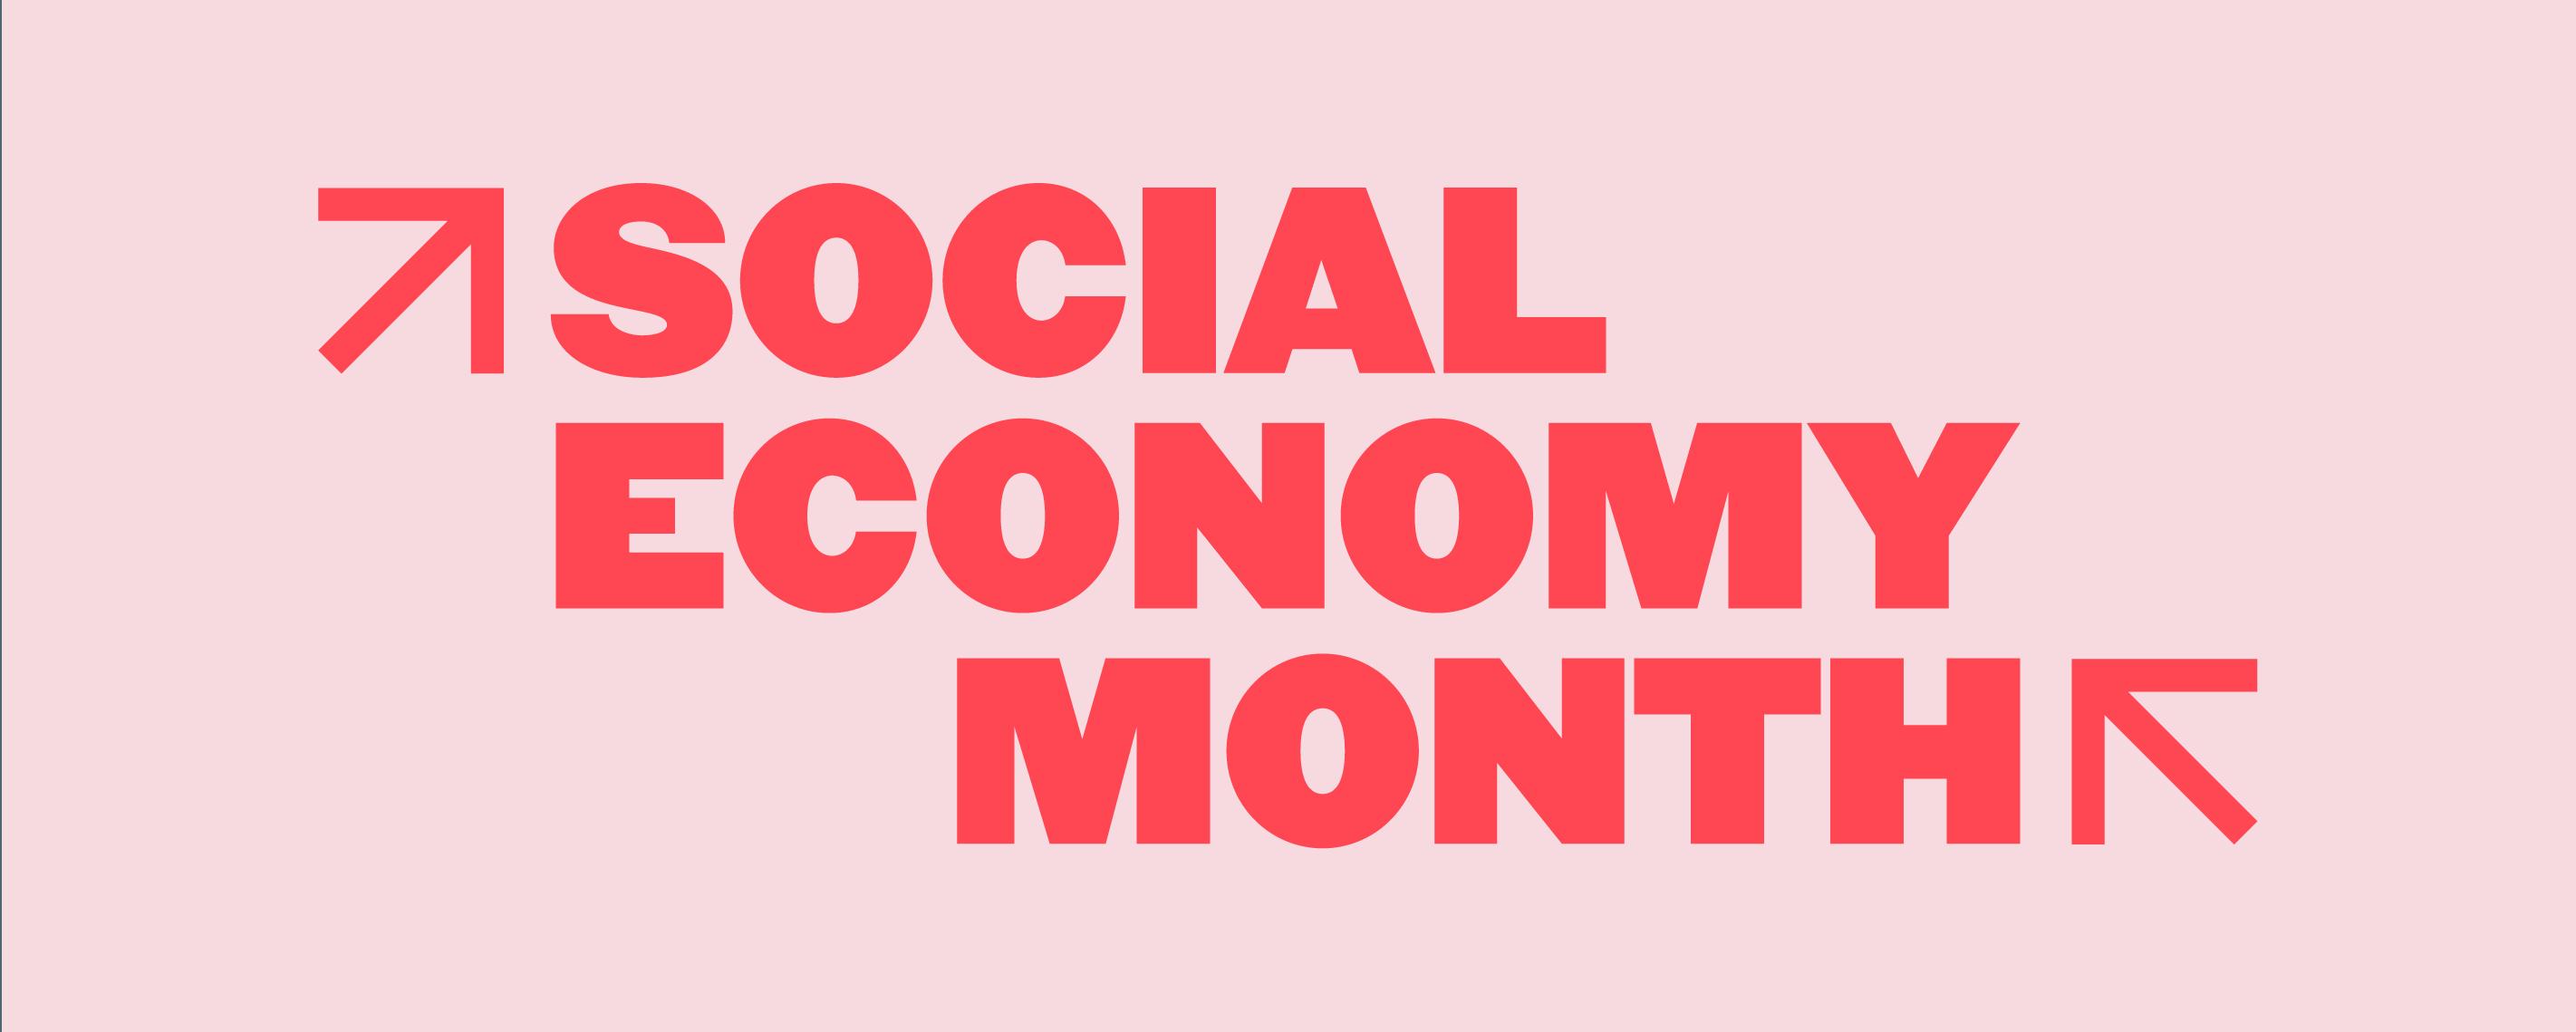 Social Economy Month 2020